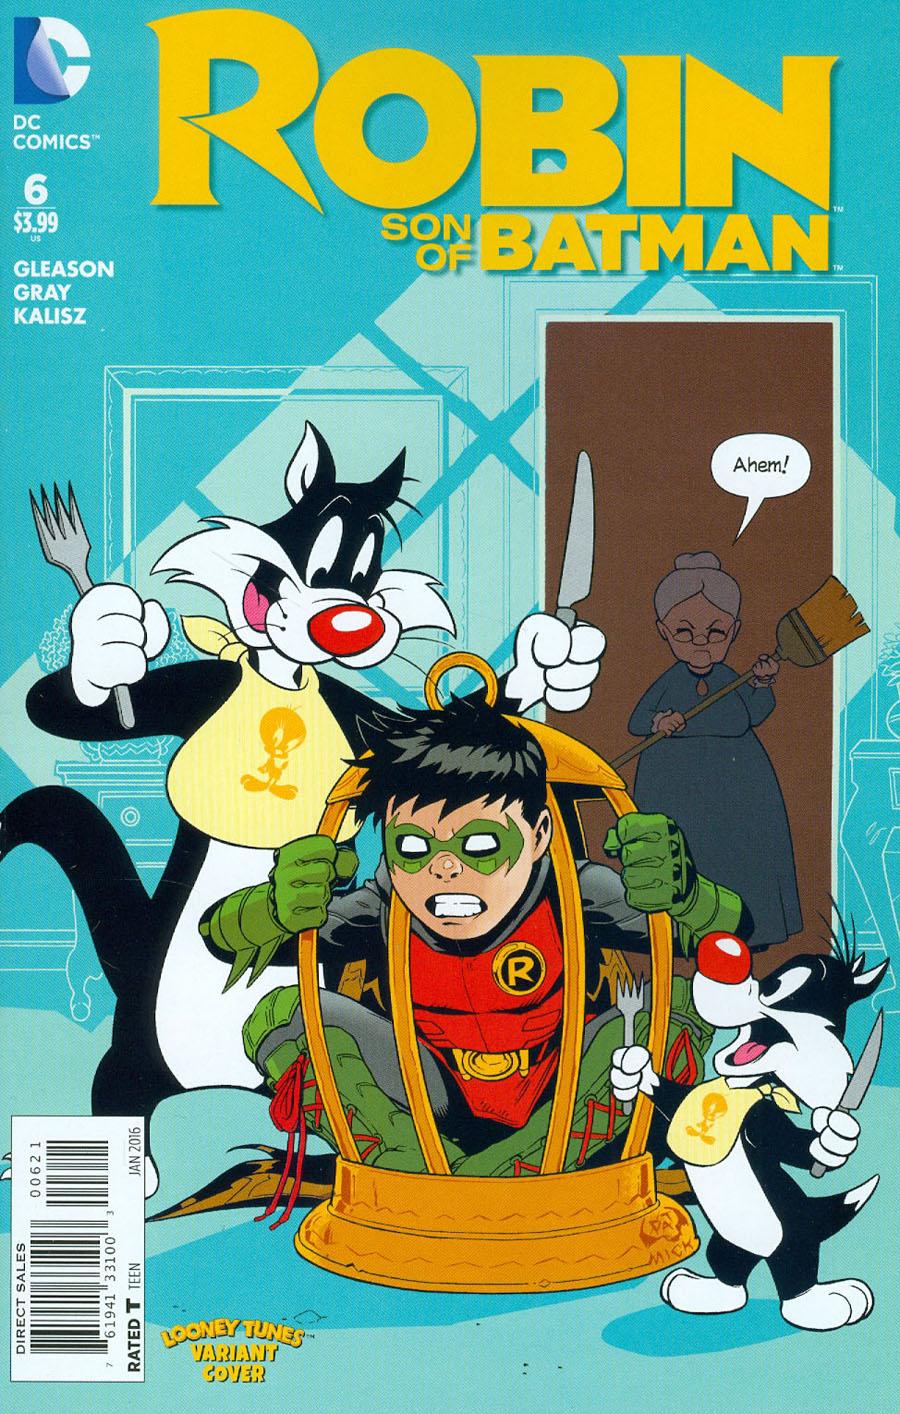 Robin Son Of Batman #6 Cover B Variant Patrick Gleason & Warner Bros Animation DC x Looney Tunes Cover